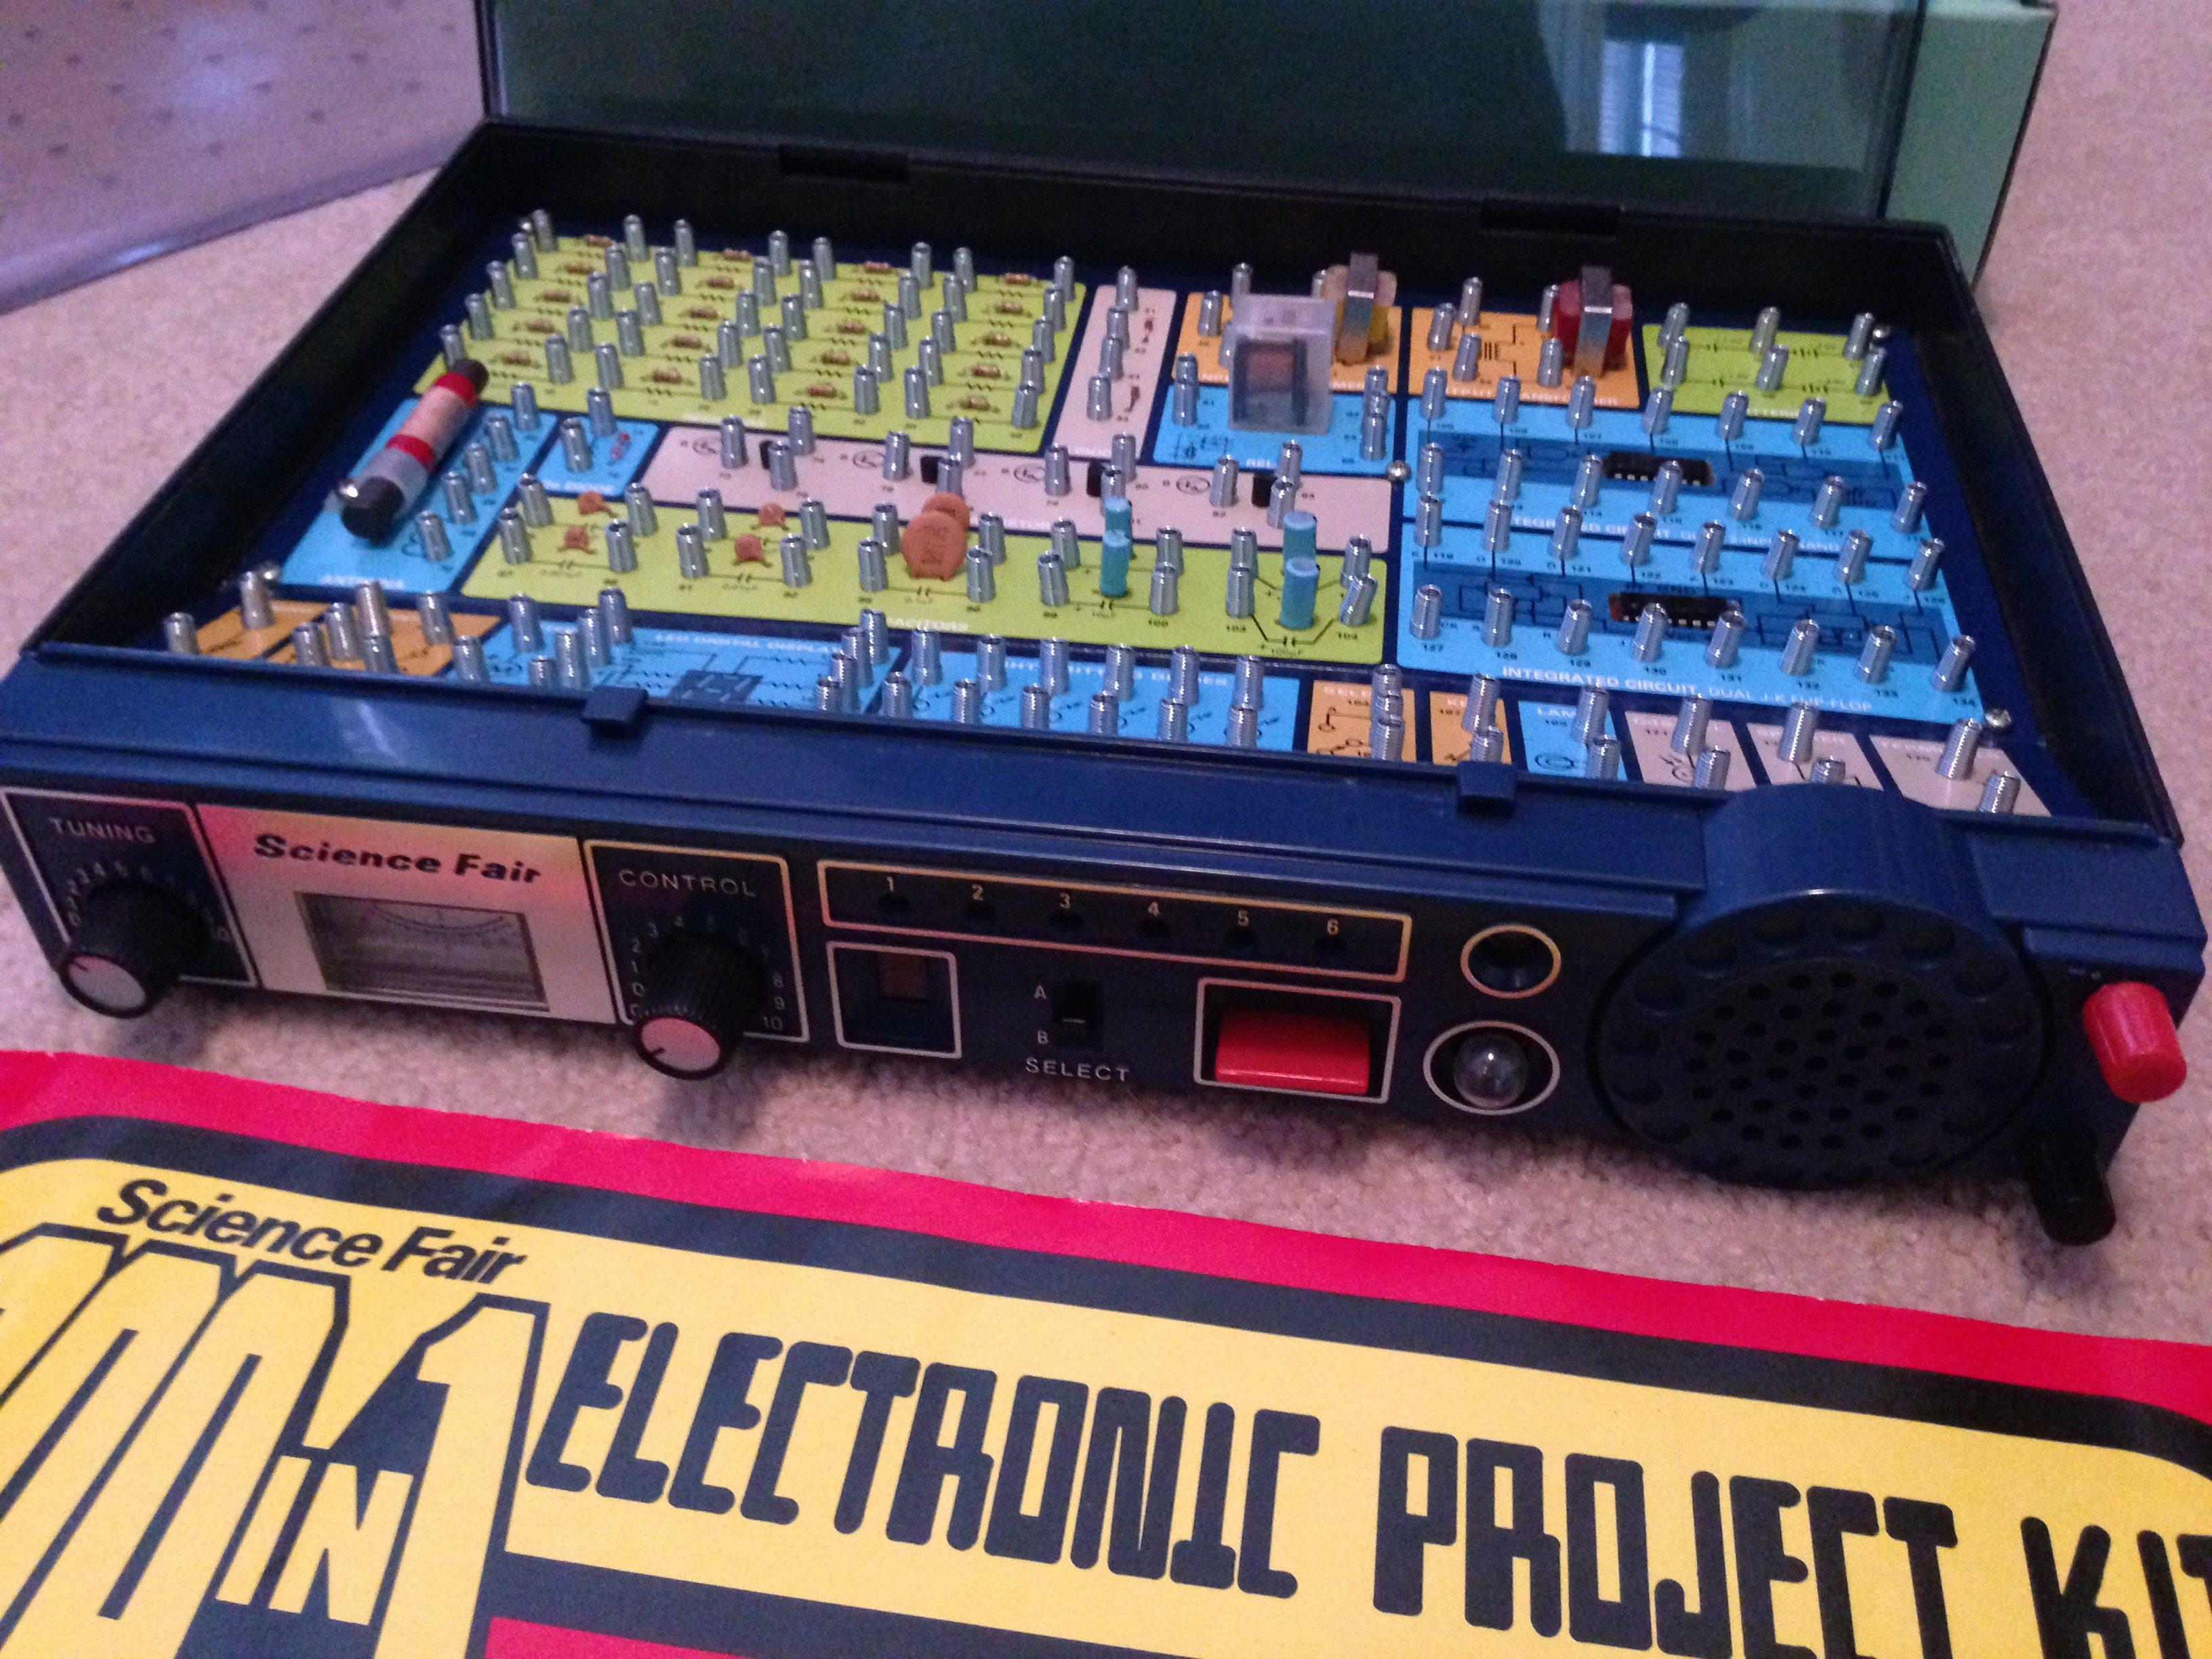 Hobbyist kits yesterday 200 in 1 and today duinokit geekdad kit 2 solutioingenieria Gallery